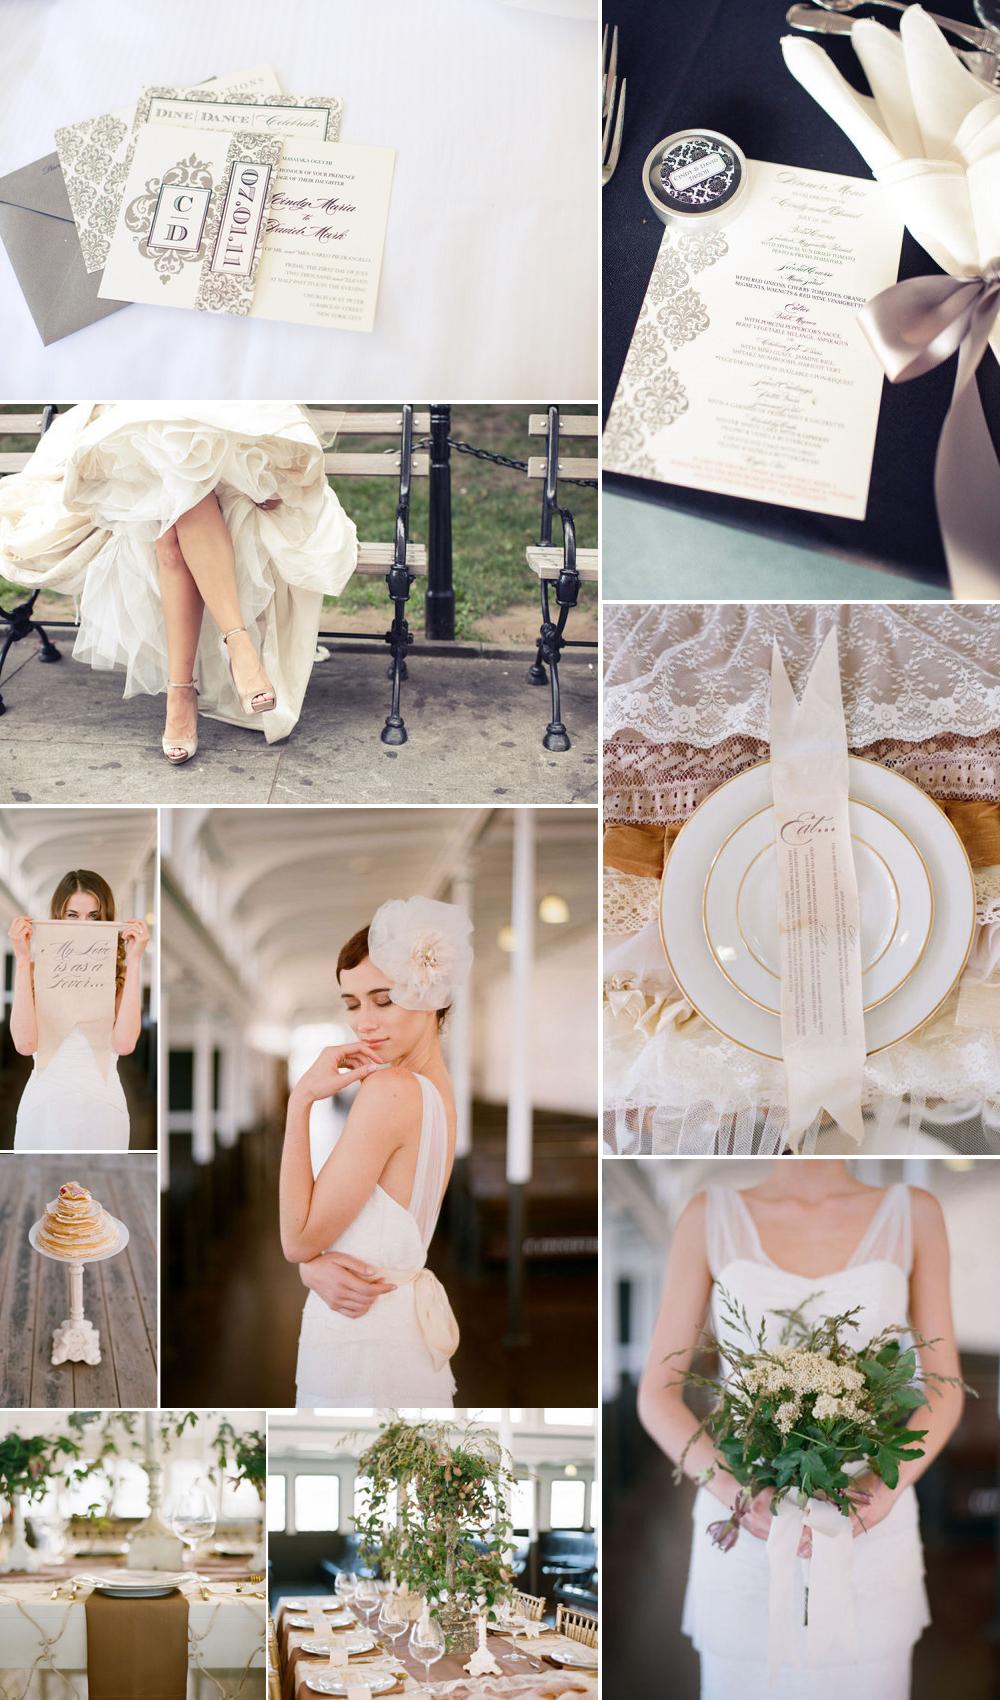 Elegant wedding colors neutrals tans ivory cream blush for Elegant neutral paint colors